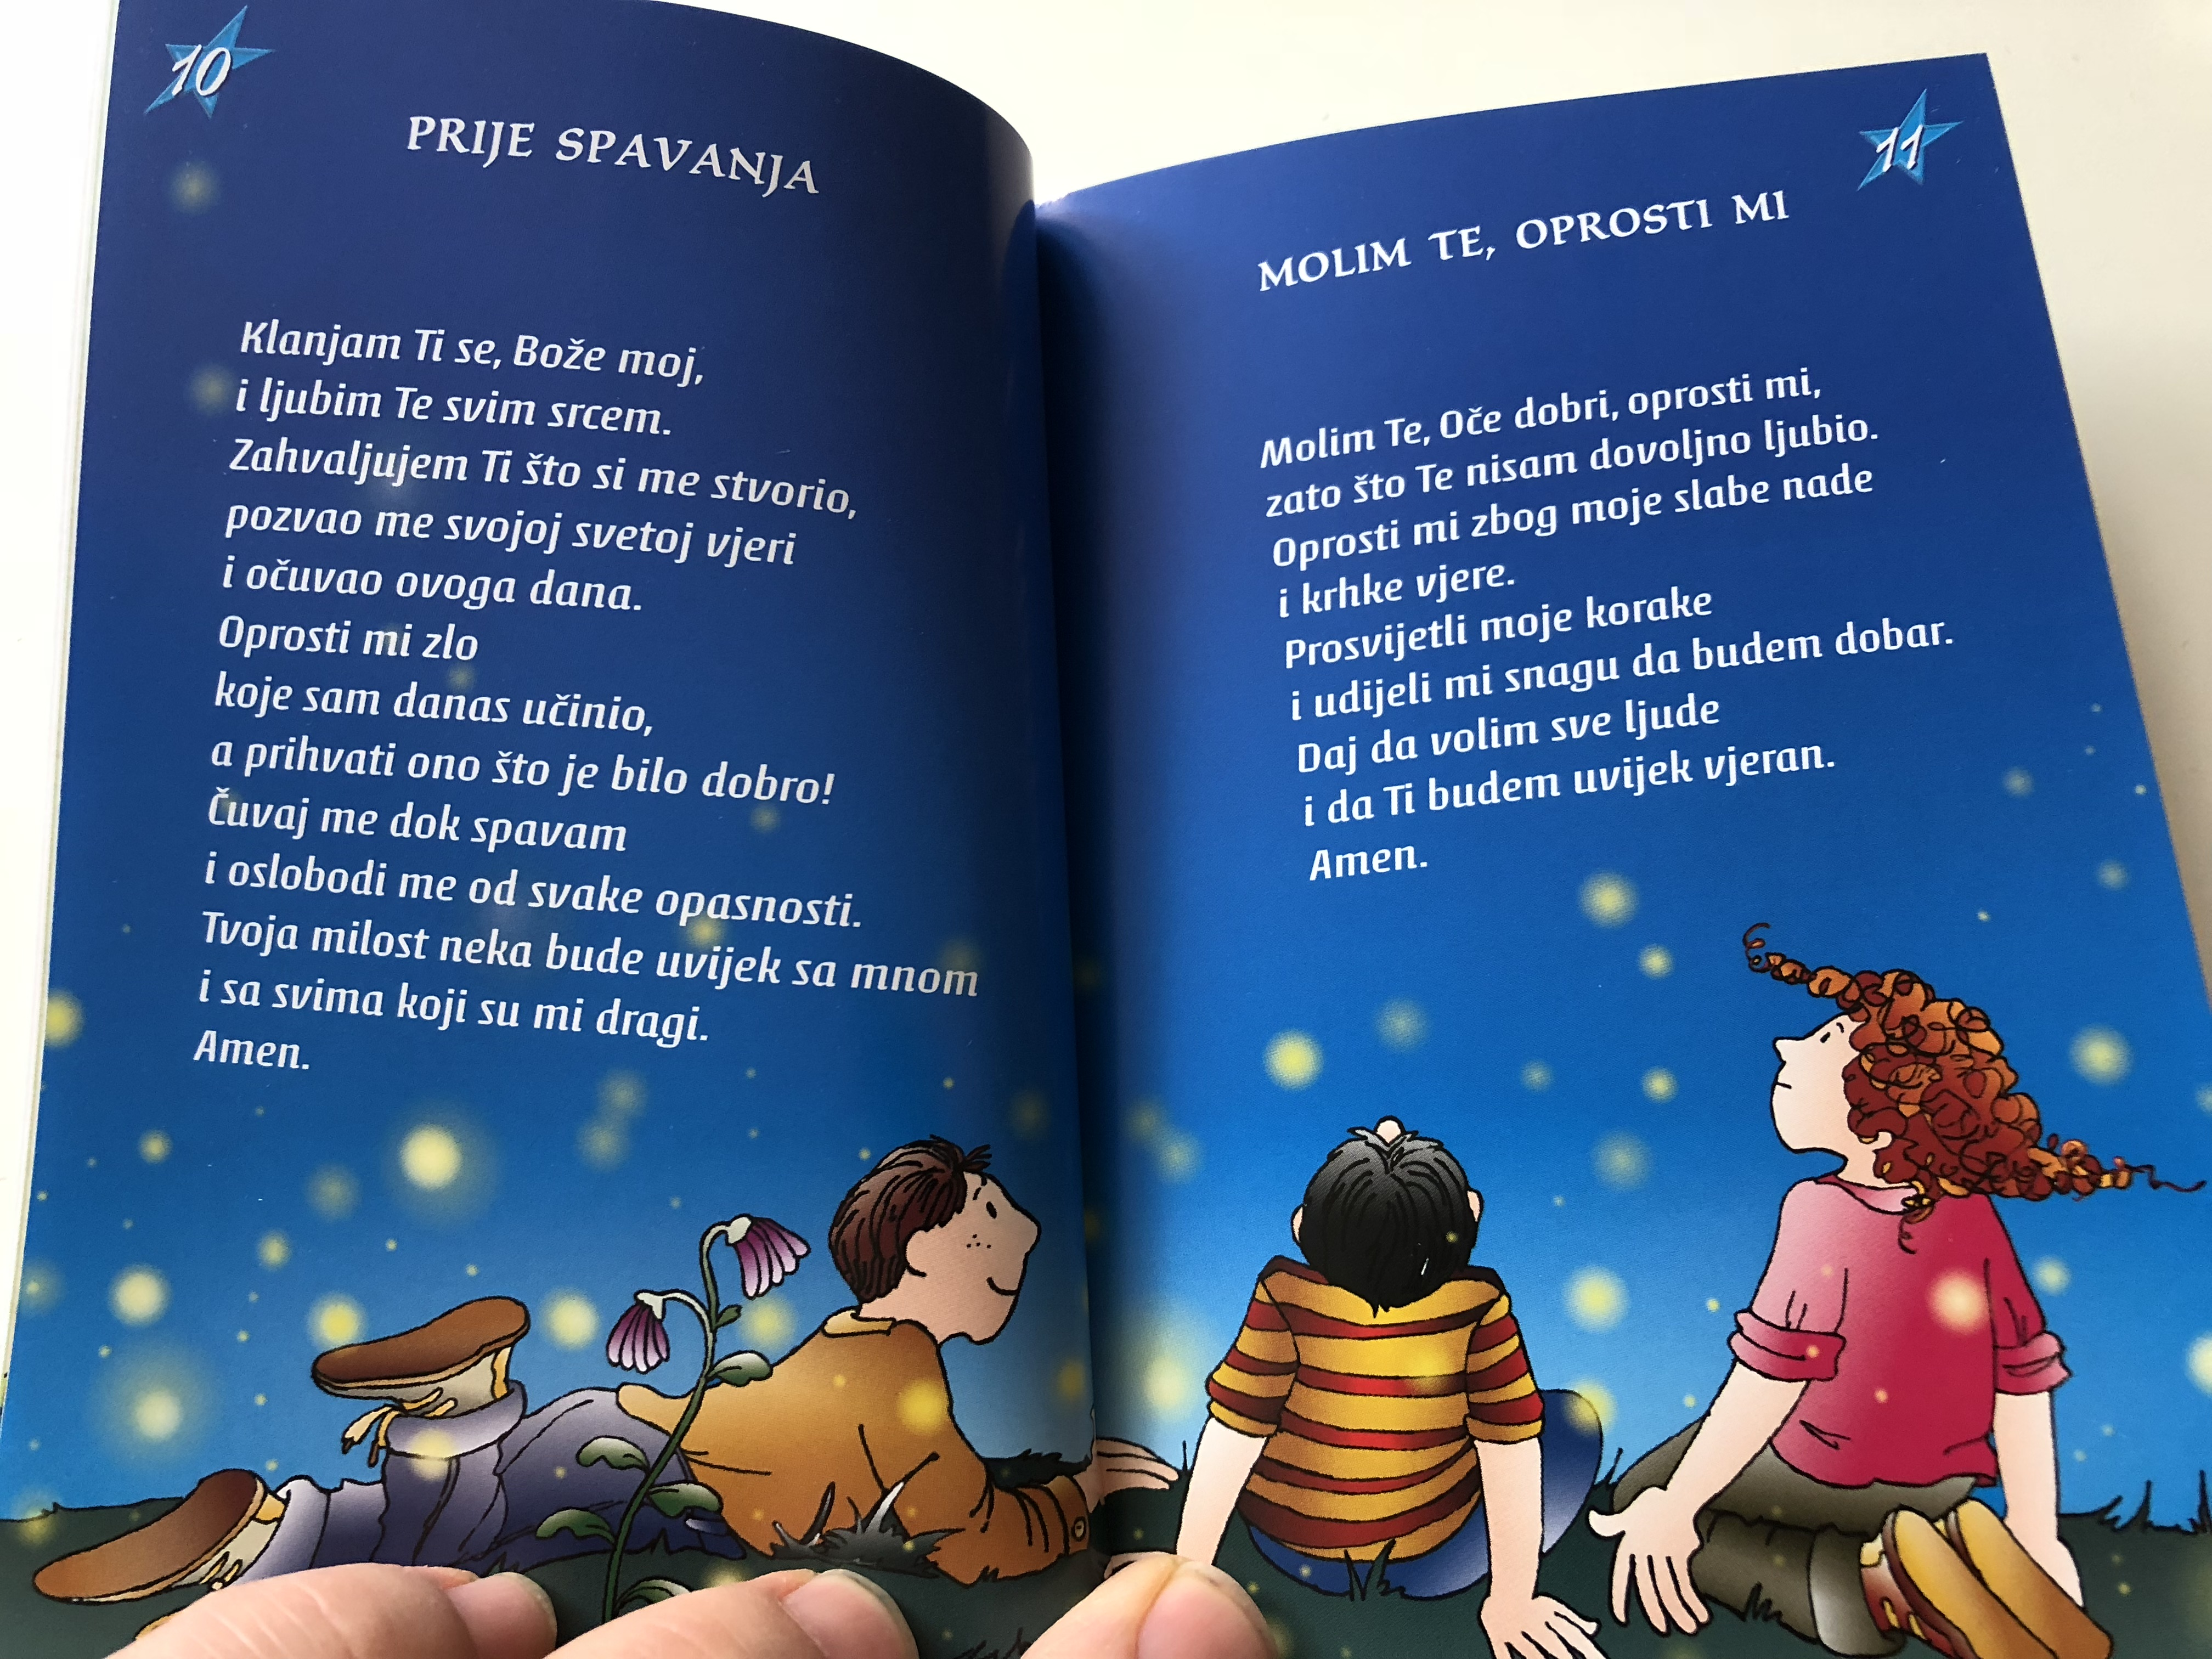 gospodine-prijatelju-moj-lord-my-friend-my-little-prayerbook-croatian-language-edition-of-signore-amico-mio-5-.jpg